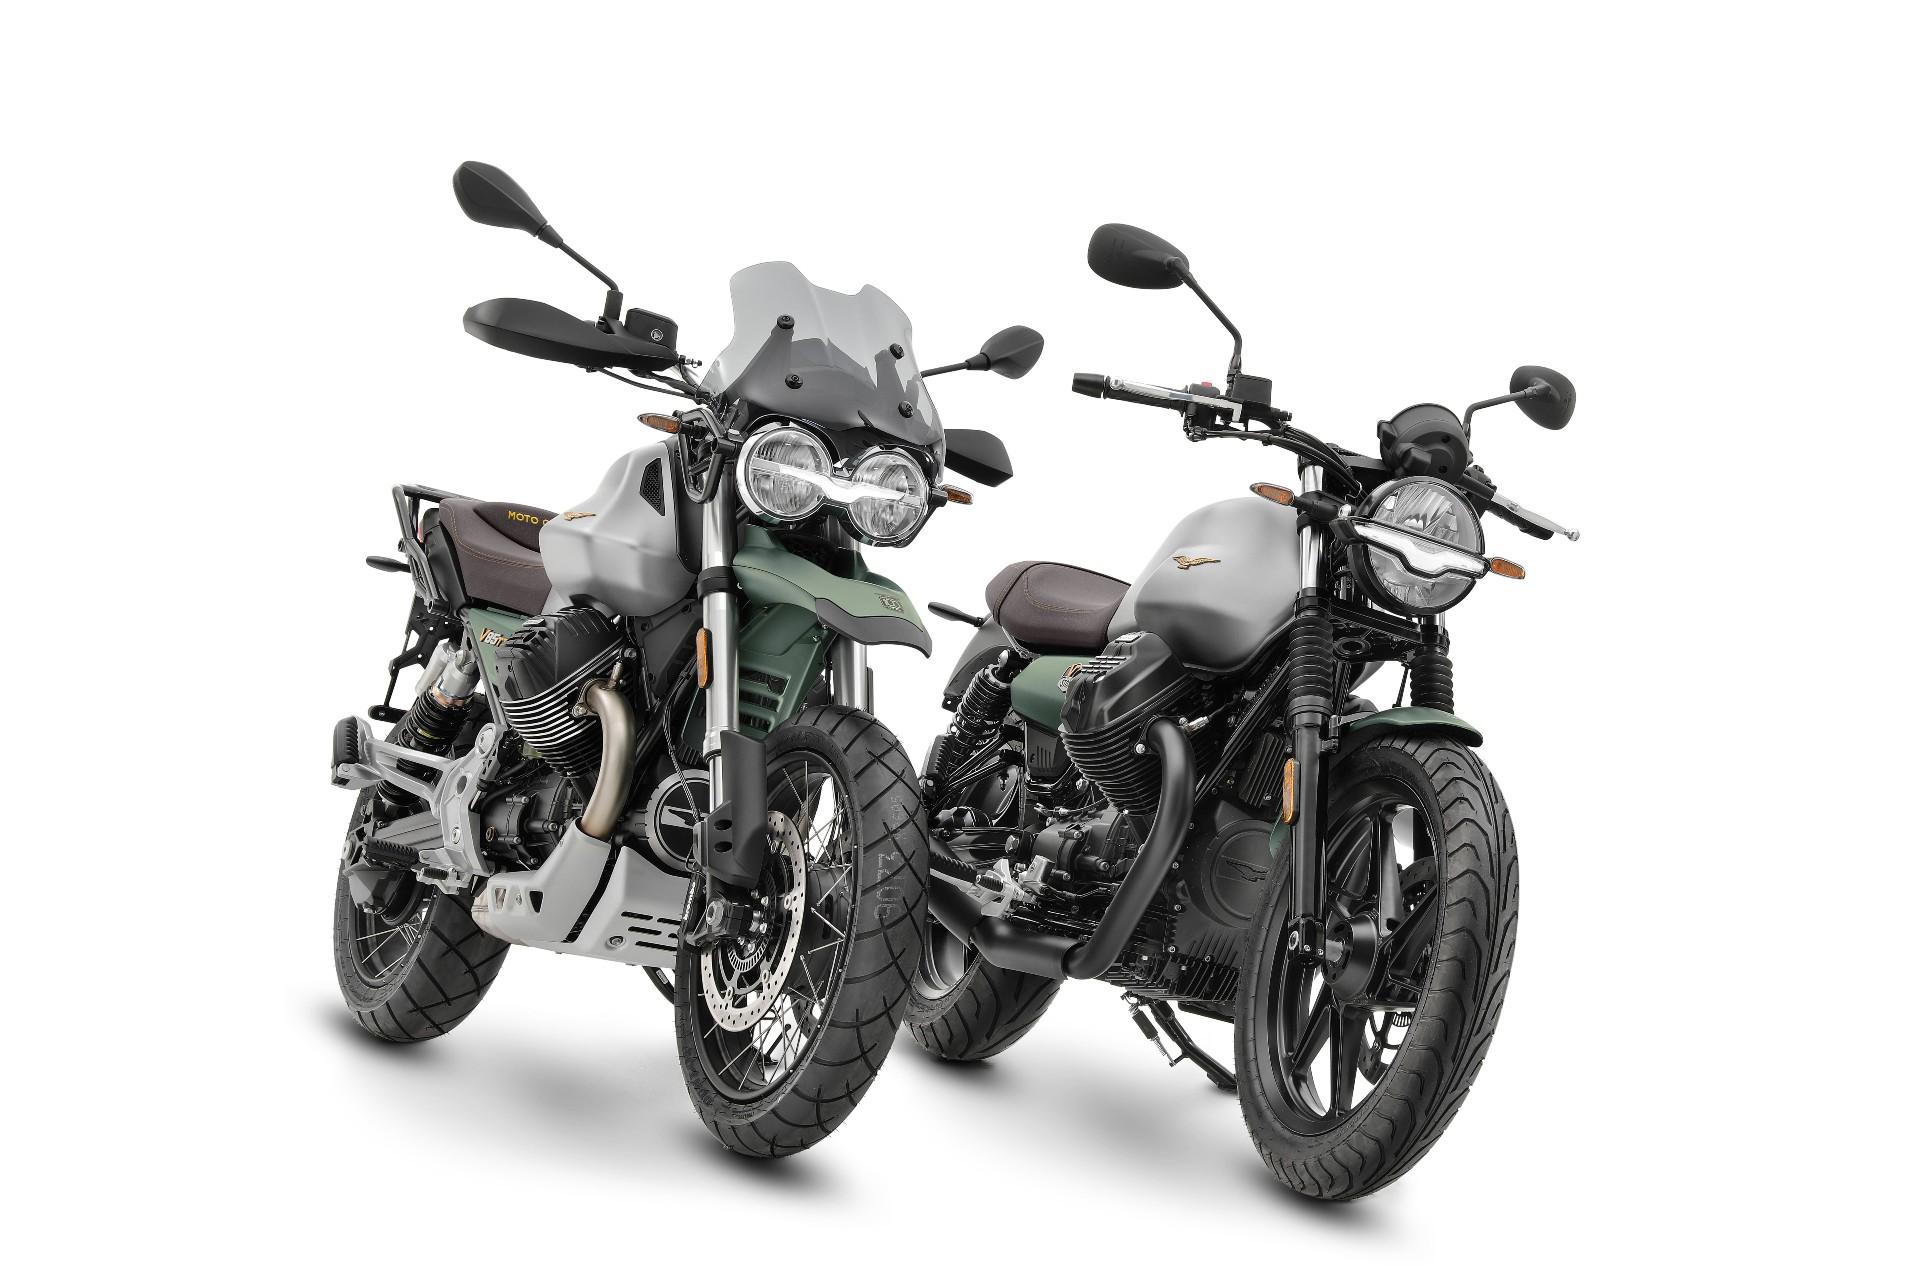 The Moto Guzzi V85 TT Centenario: £11,400 RRP and Moto Guzzi V7 Stone Centenario, £8,200 RRP